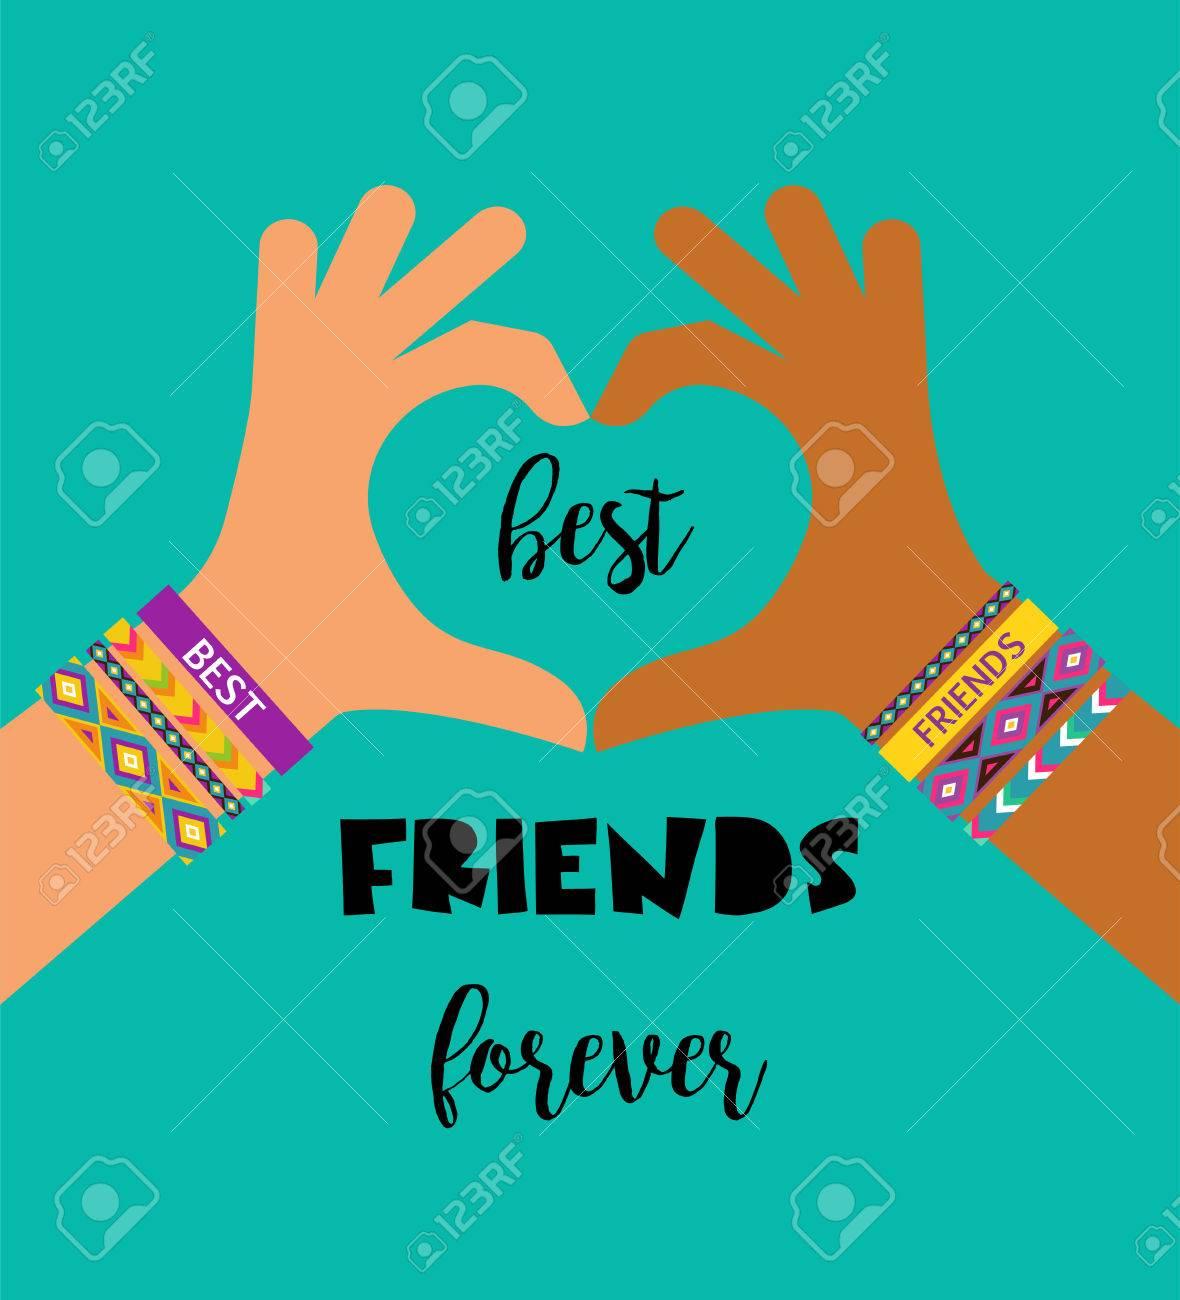 Best Friends Forever Happy Friendship Day Poster Design Banner